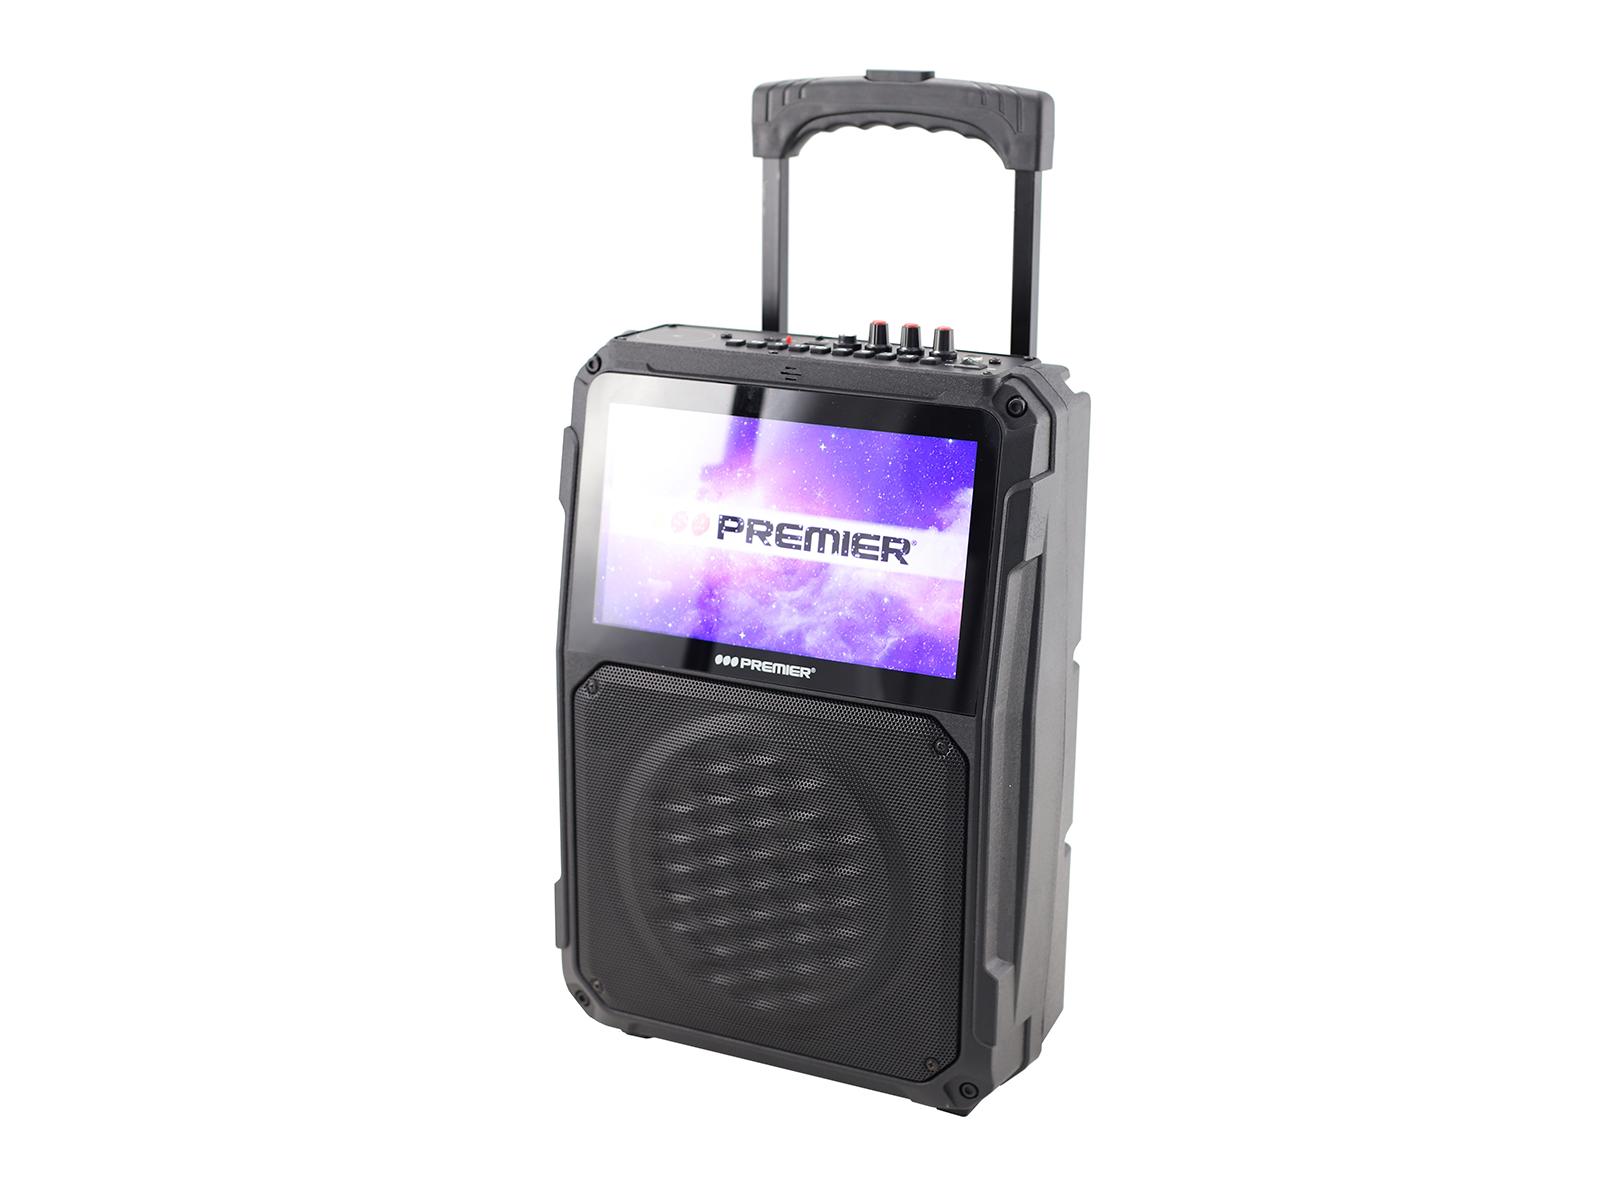 Imagen de producto Sistema portátil de karaoke con dvbt2 2